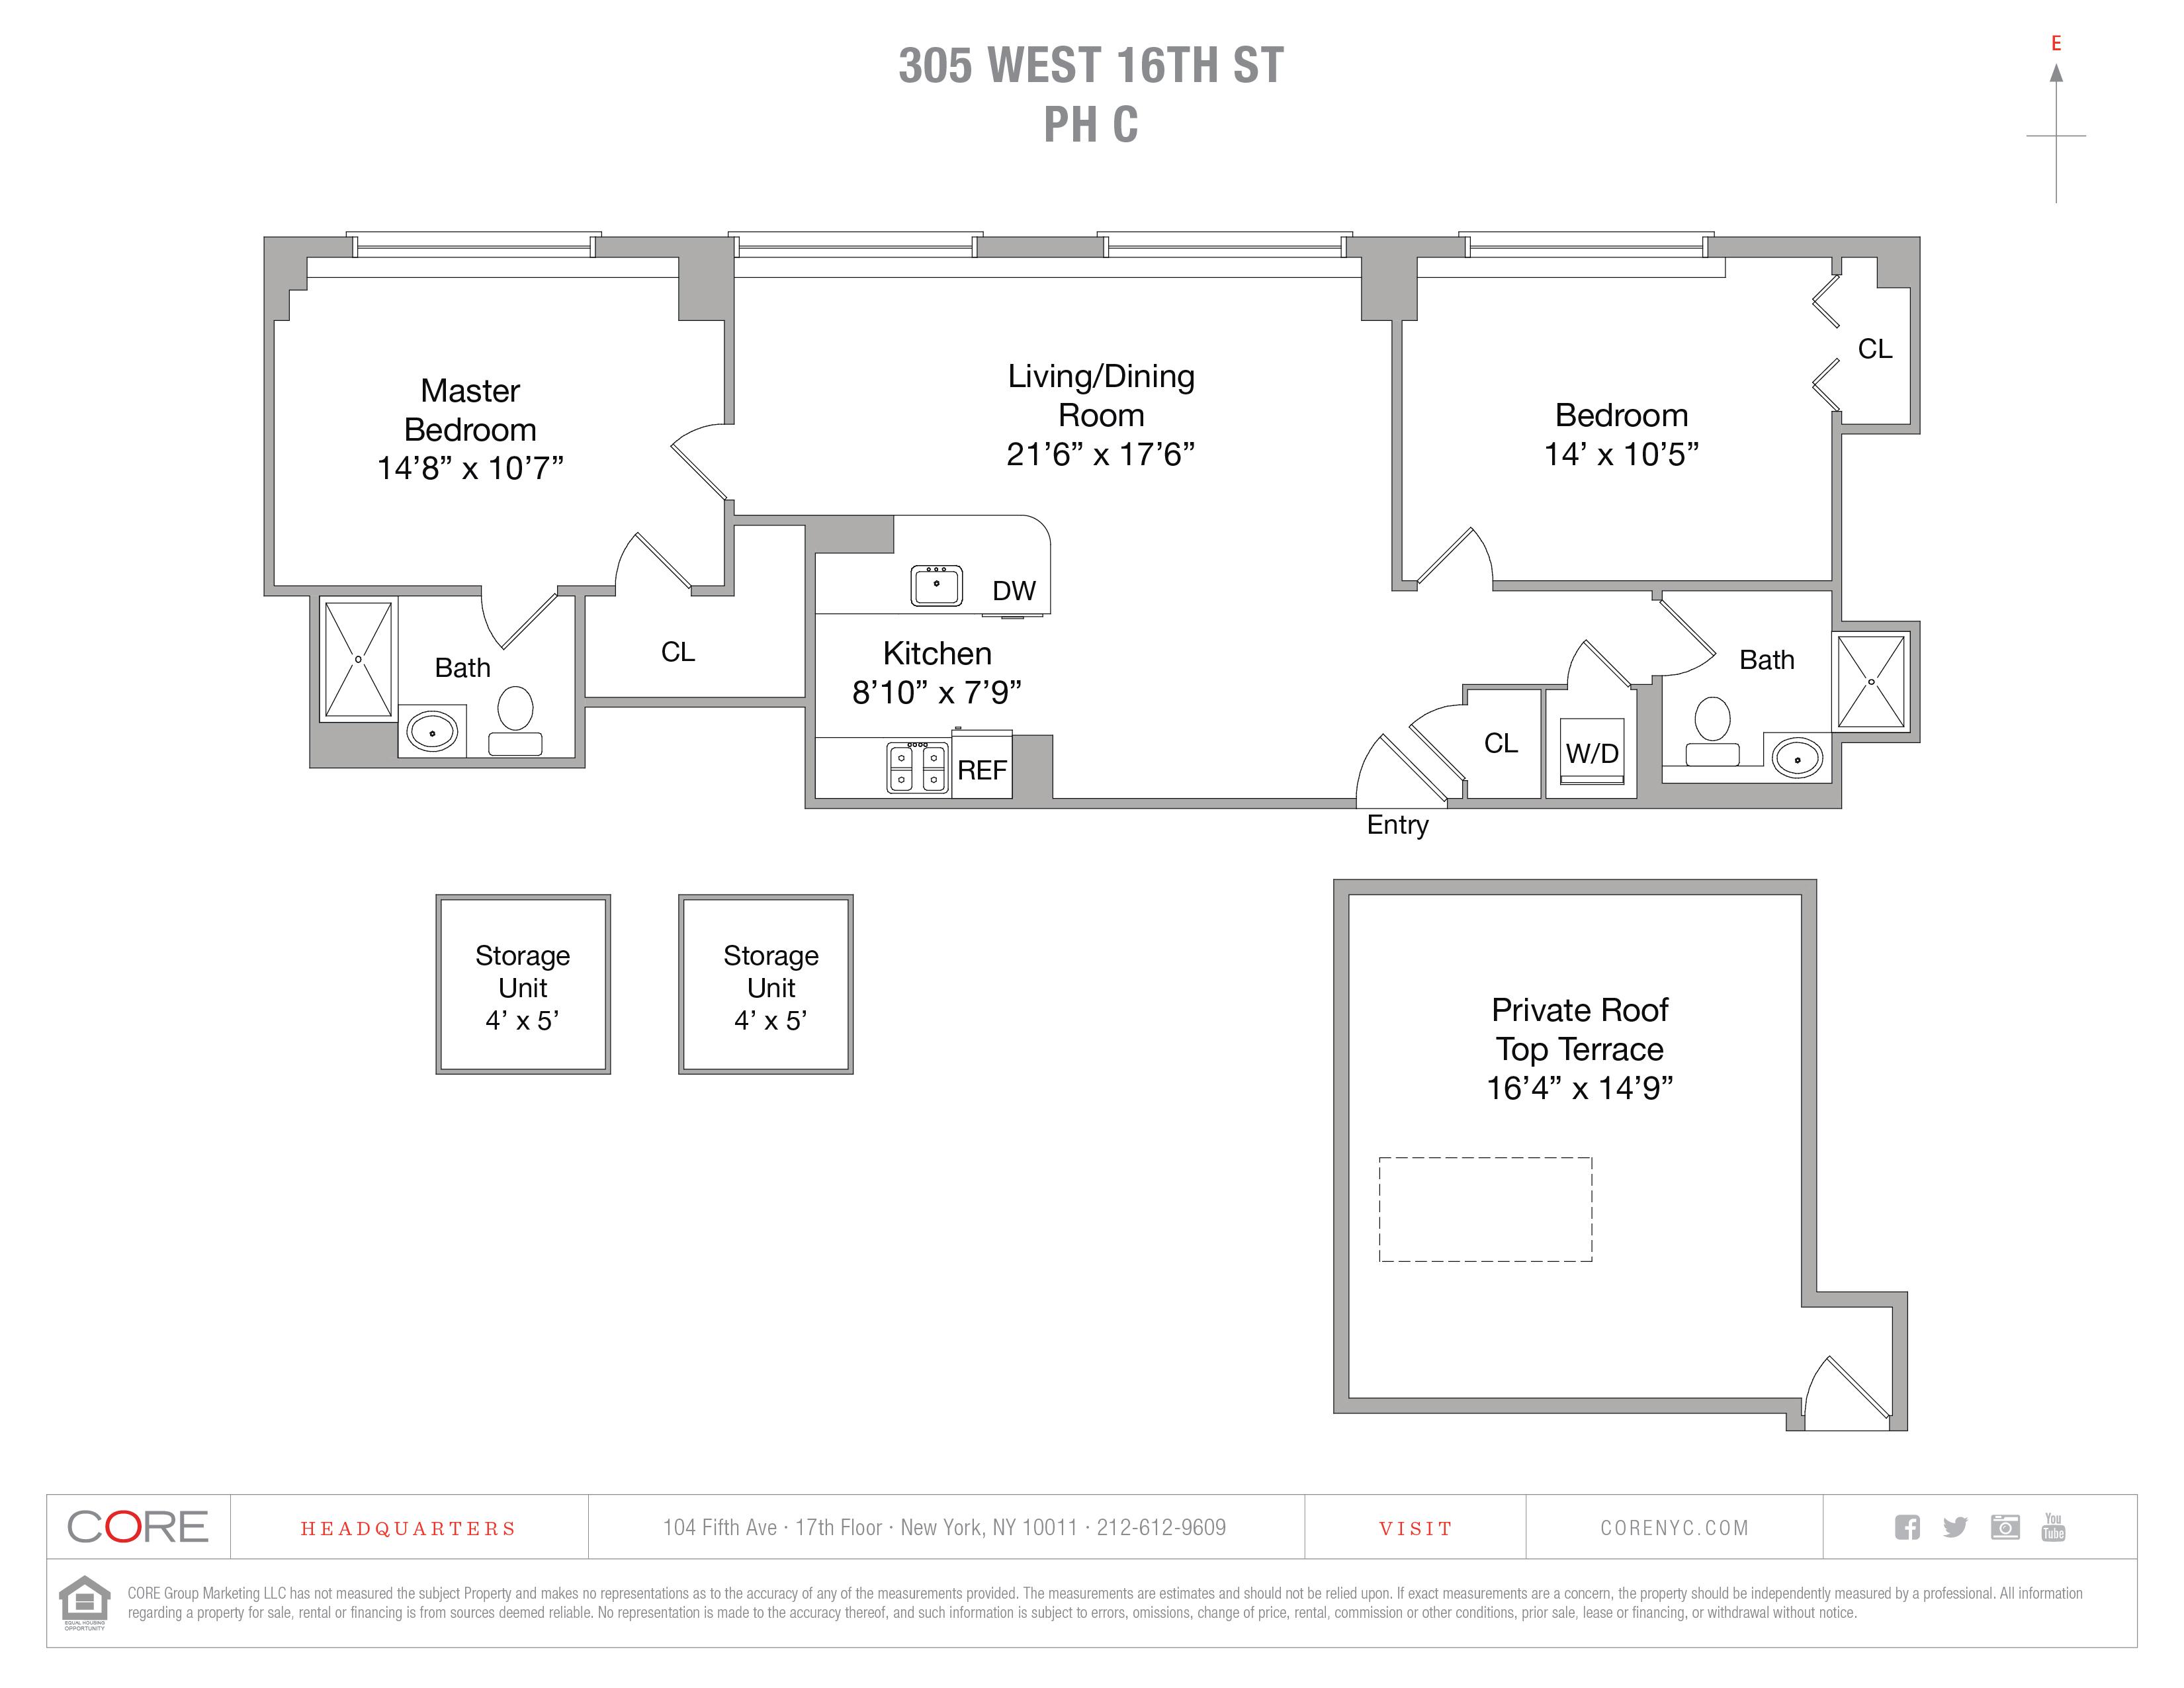 305 West 16th St. PHC, New York, NY 10011